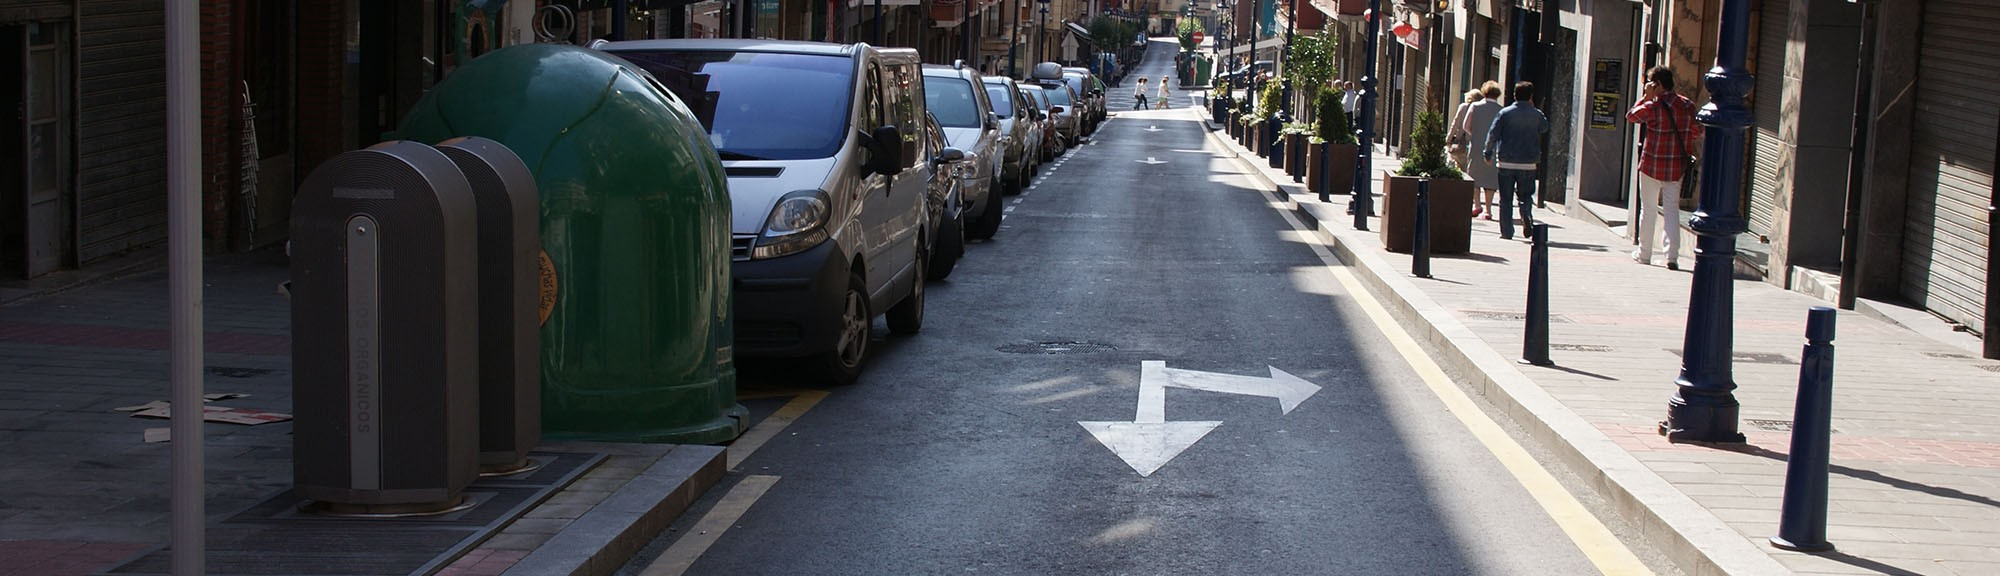 urbanizacion_de_las_calles_correos_y_gipuzkoa_en_portugalete_0